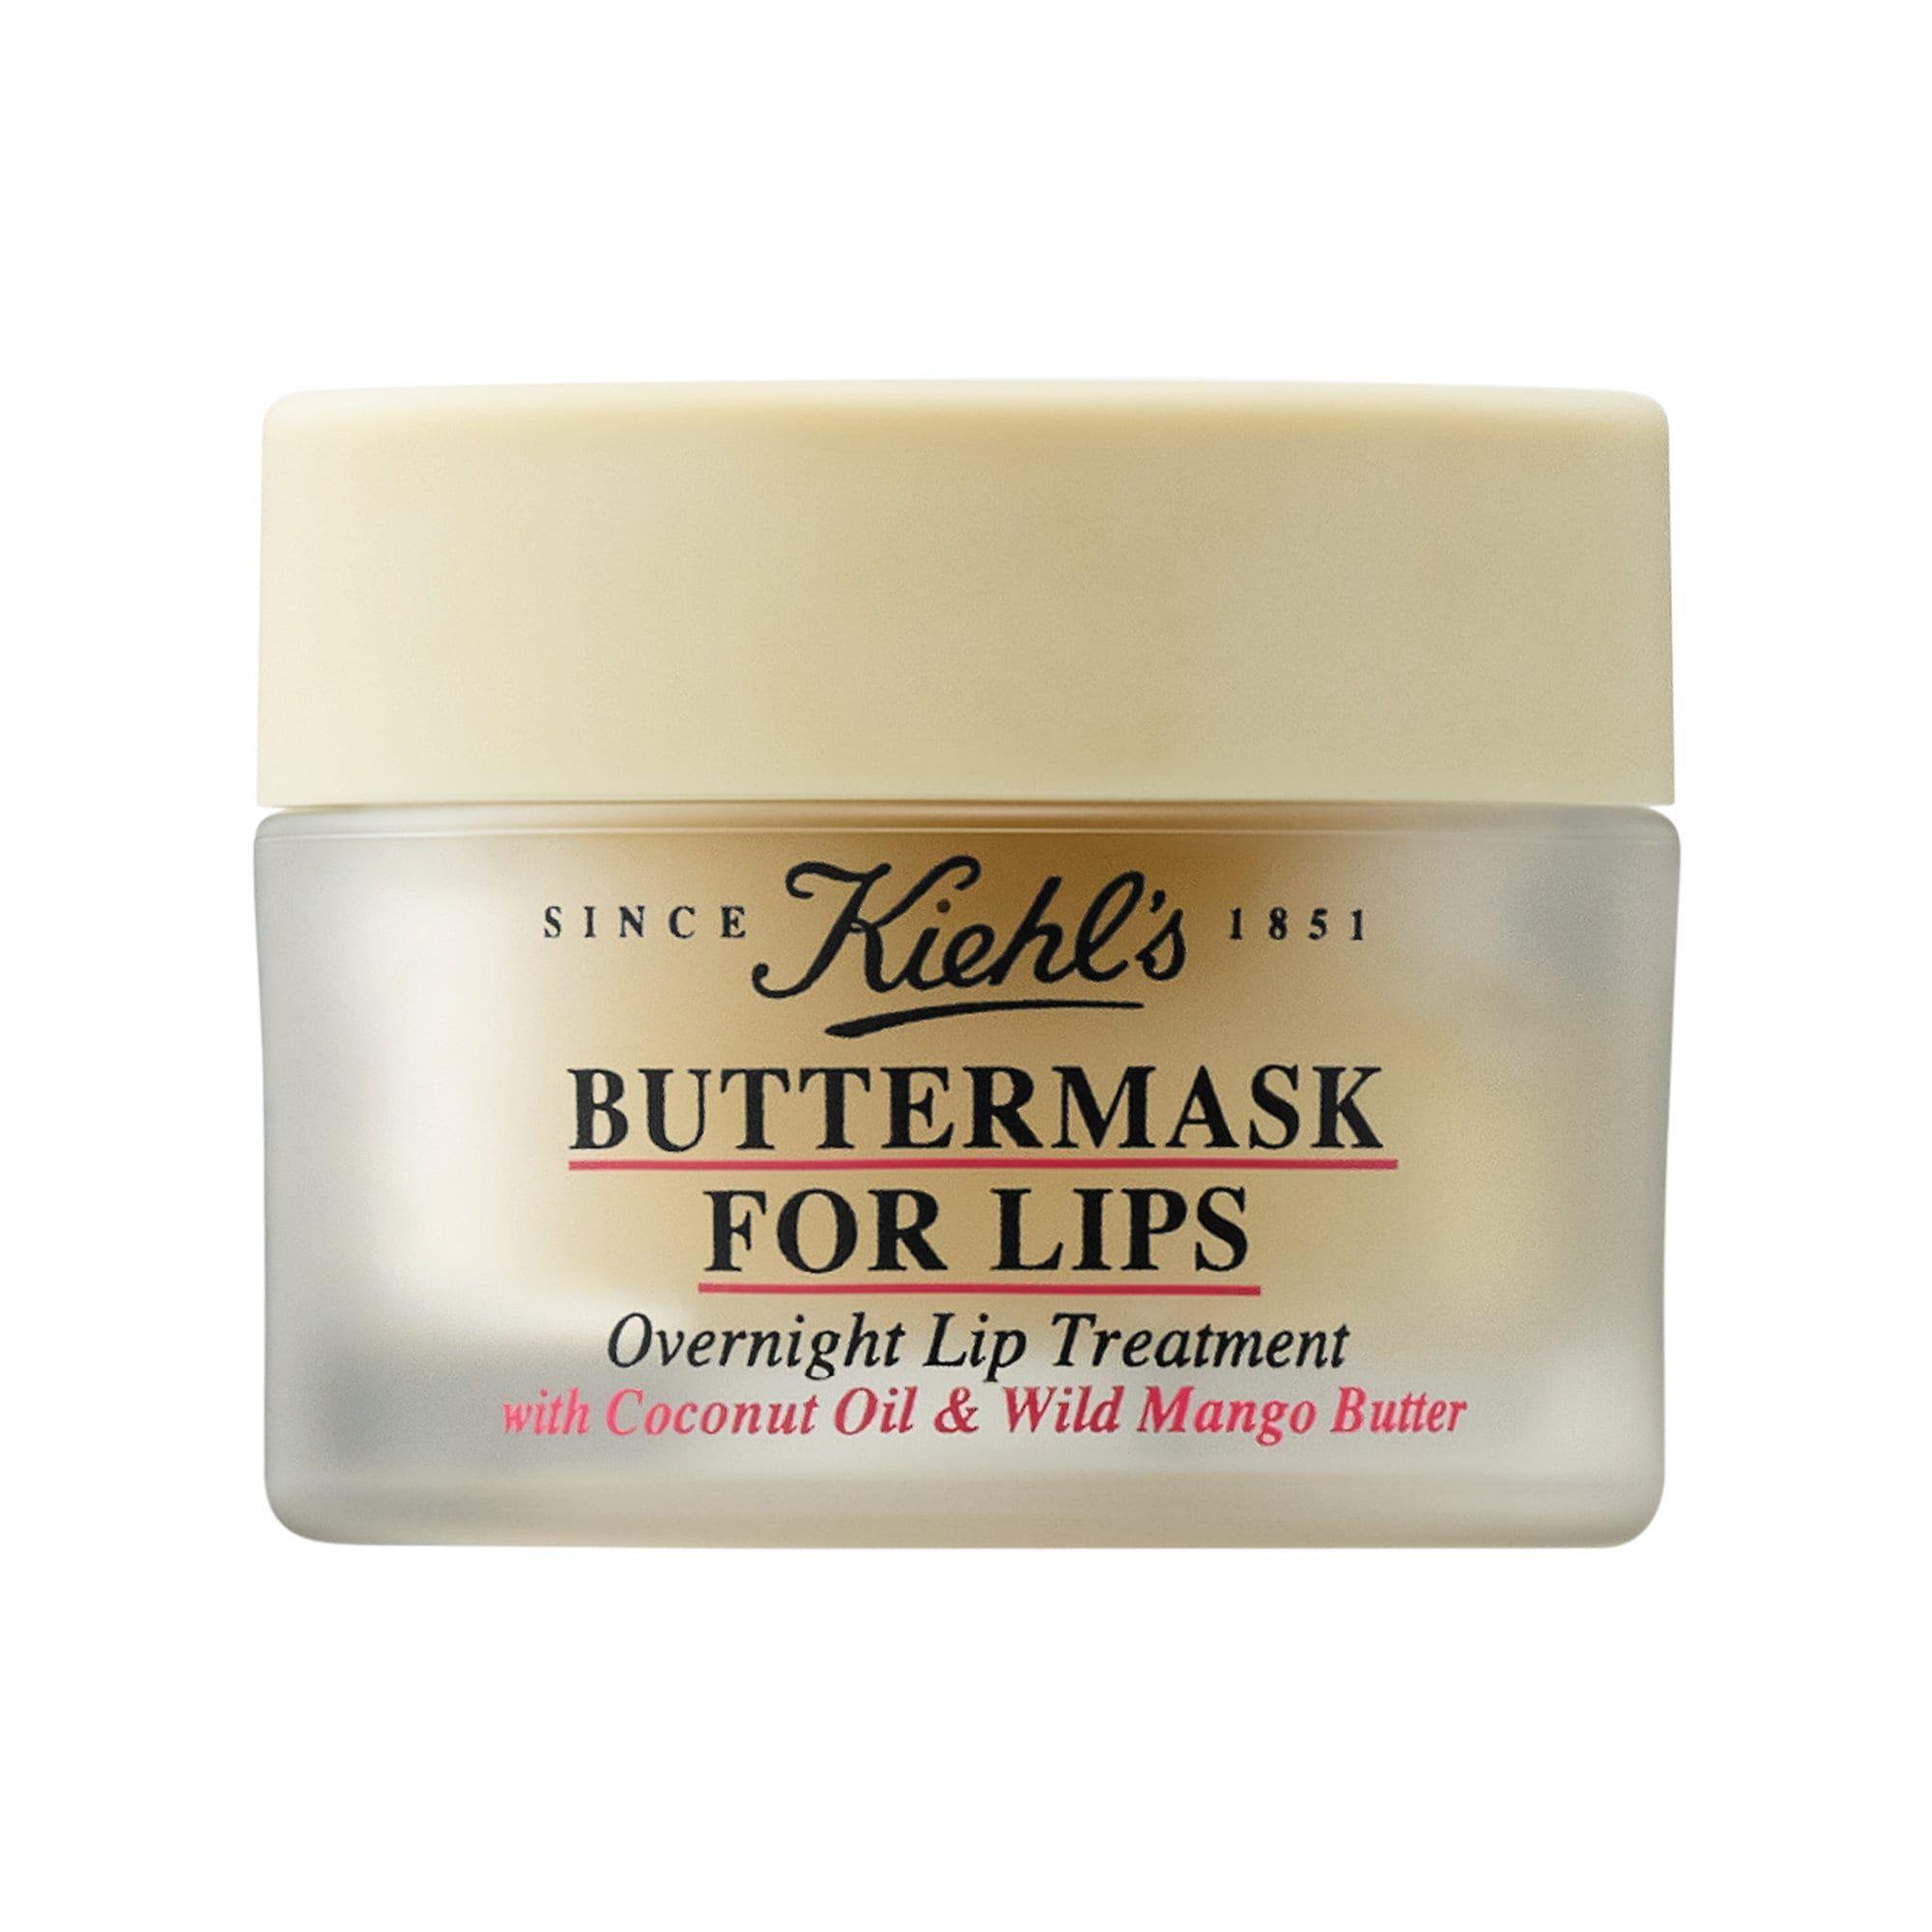 Kiehl's Since 1851 Buttermask Intense Repair Lip Treatment 0.35 oz/ 10 g